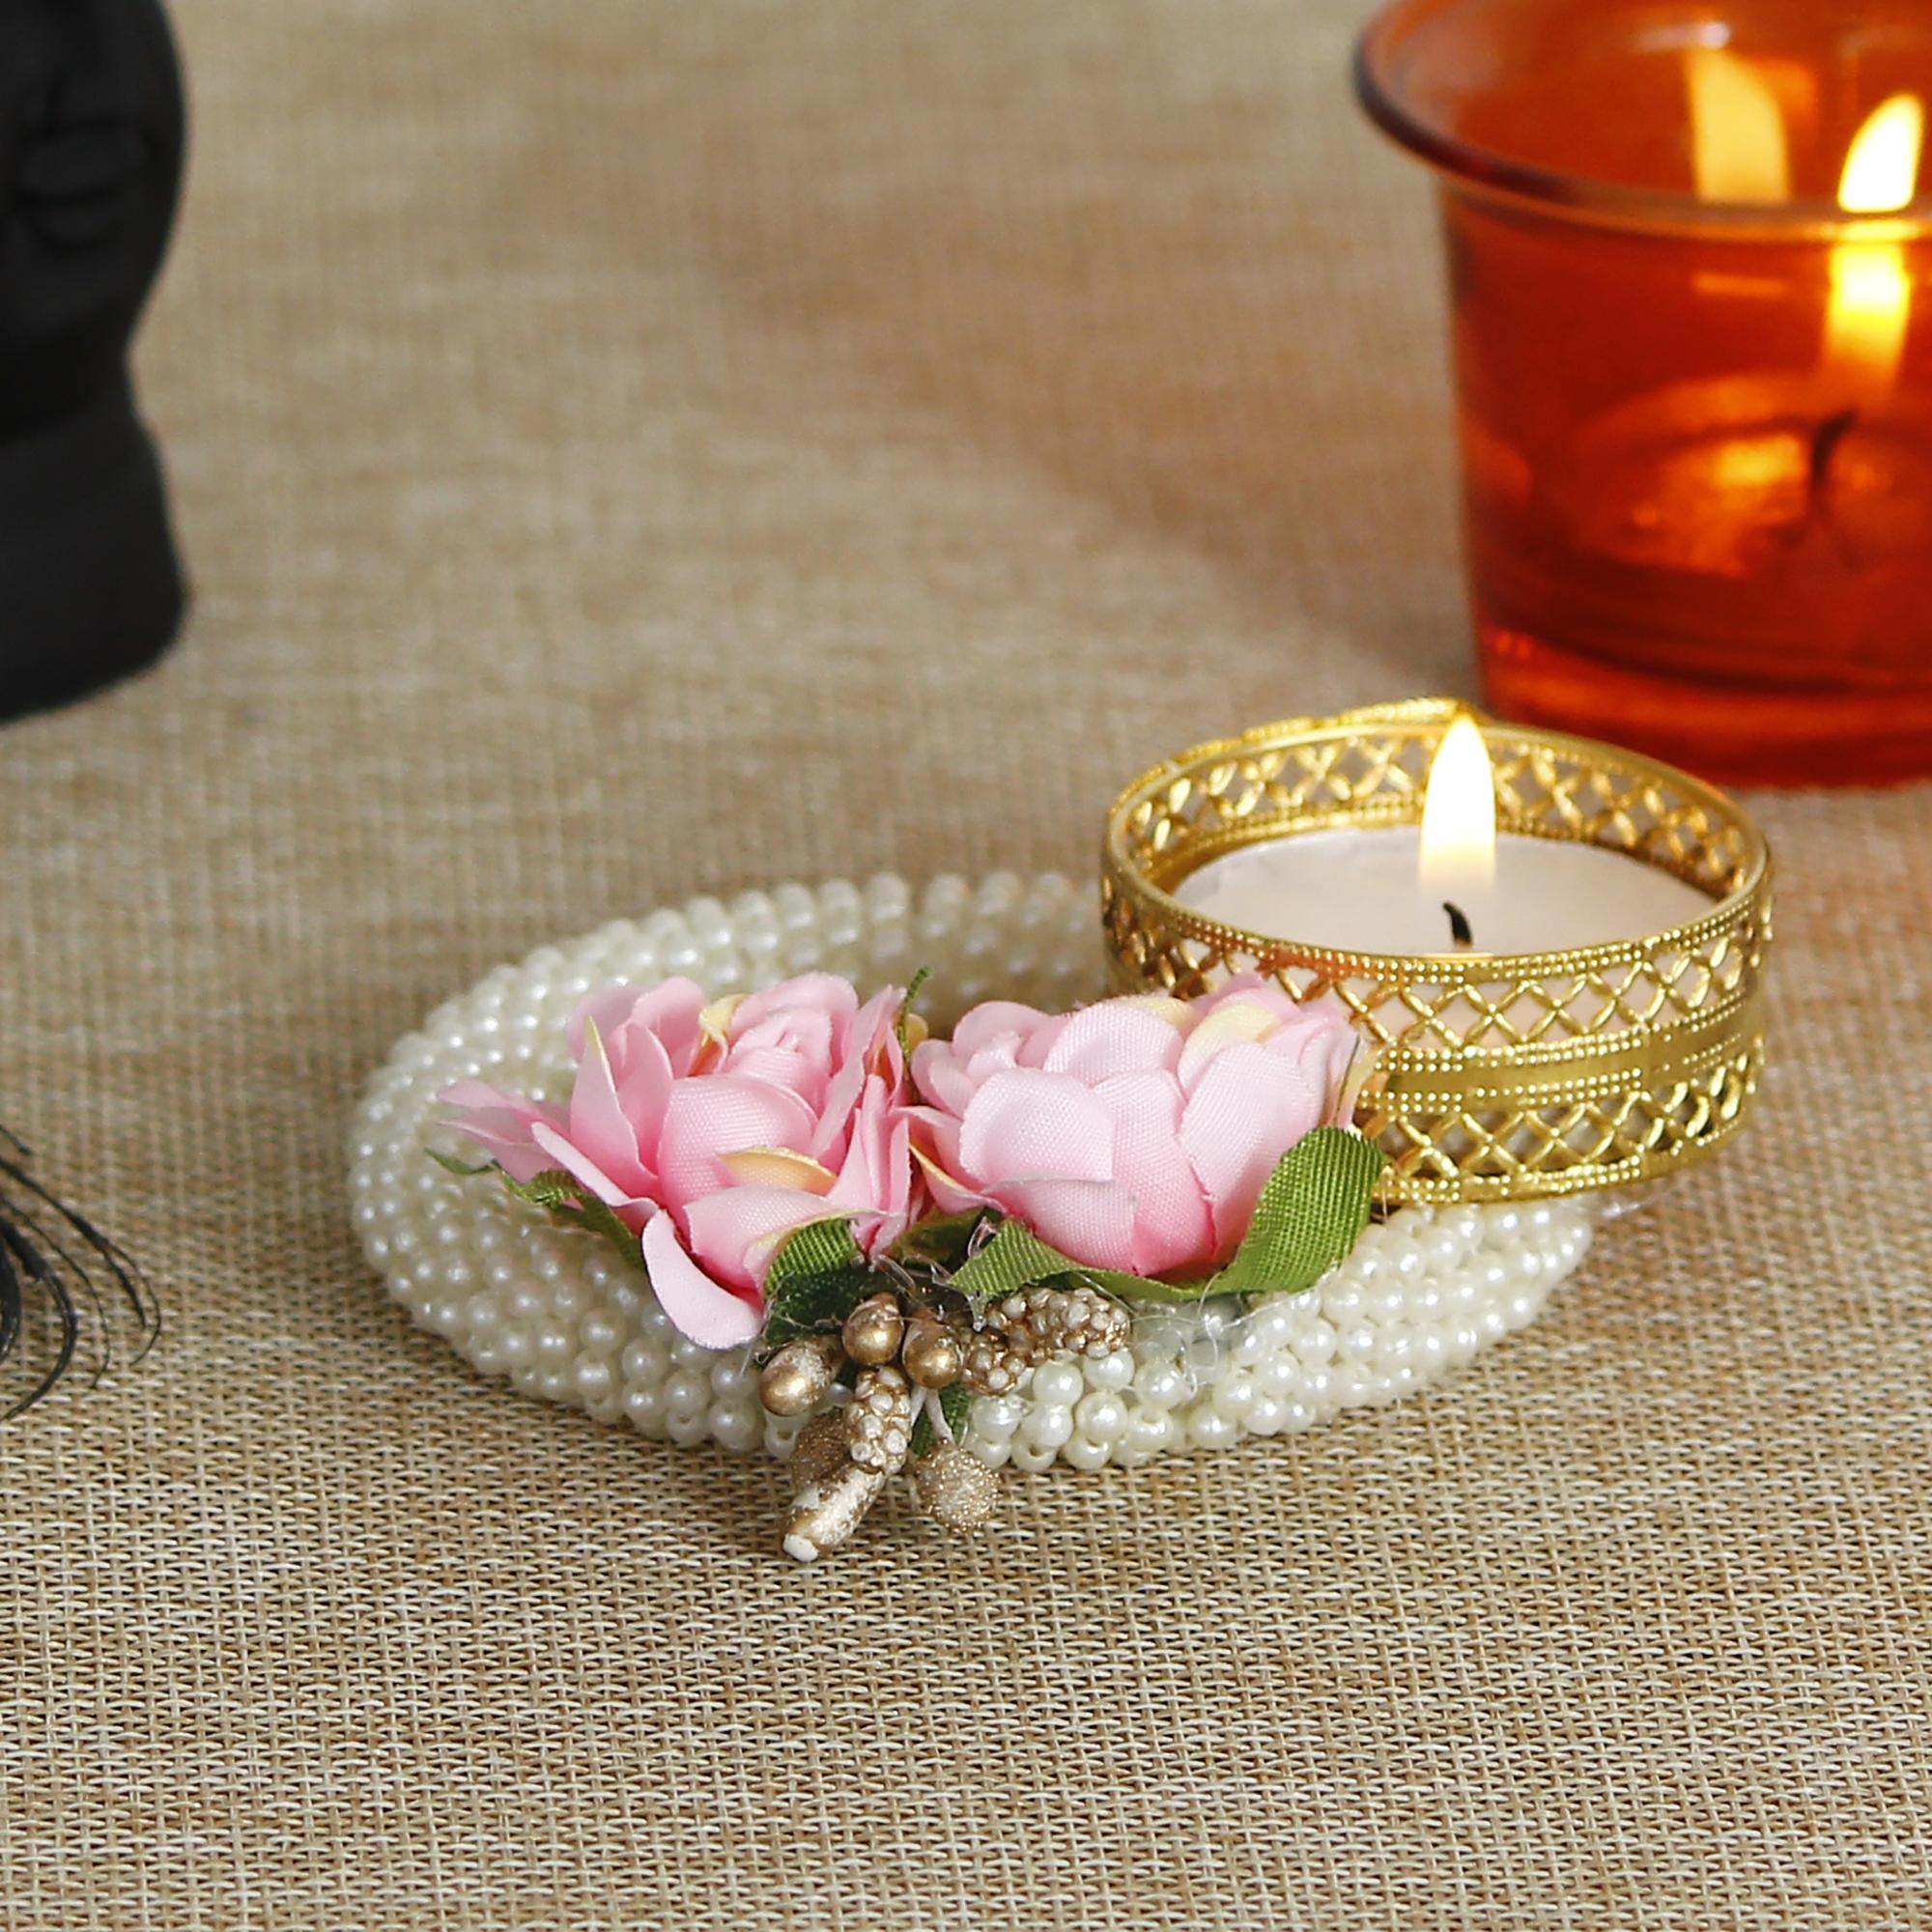 Decorative Handcrafted Pink Floral Tea Light Holder on Pearl Bangle Indian Home Decor